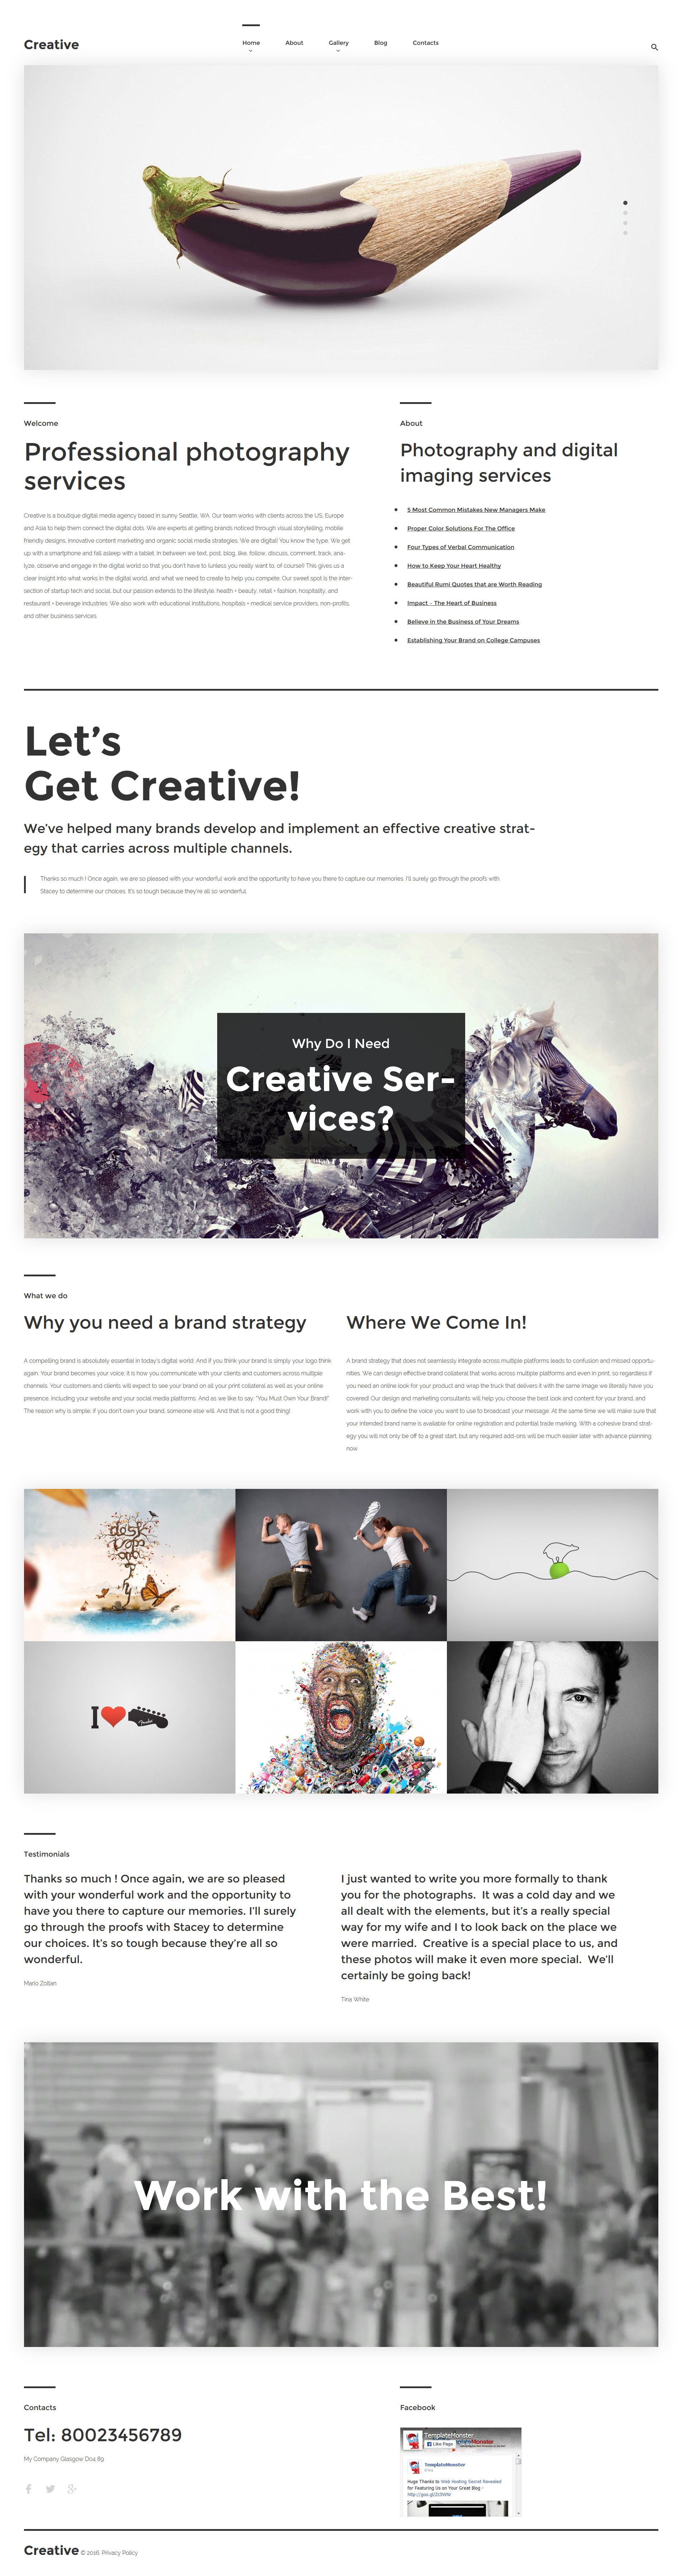 """Creative"" 响应式WordPress模板 #57554 - 截图"